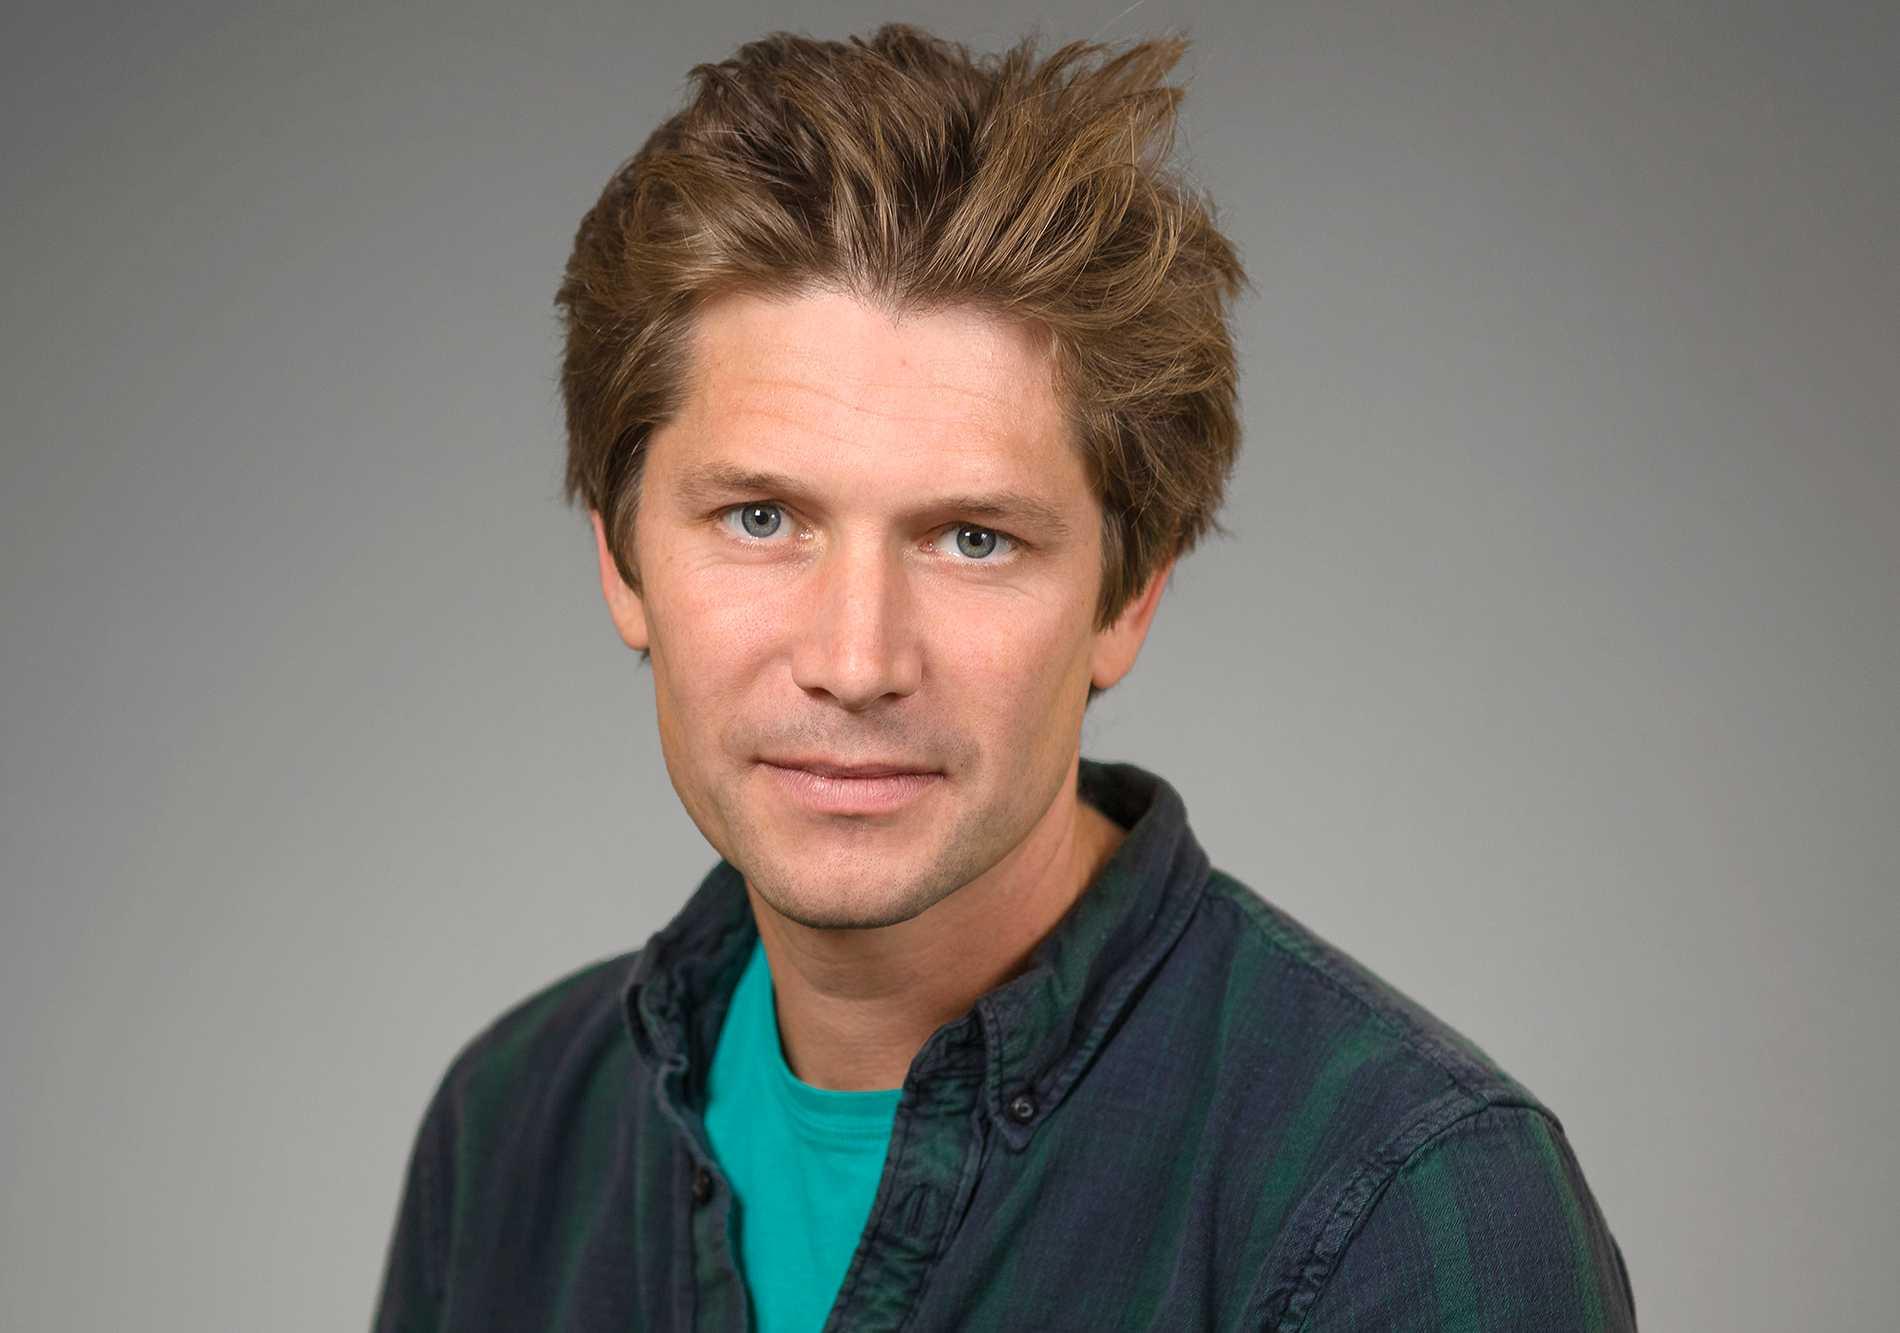 Joacim Rocklöv, professor i epidemiologi på Umeå universitet.